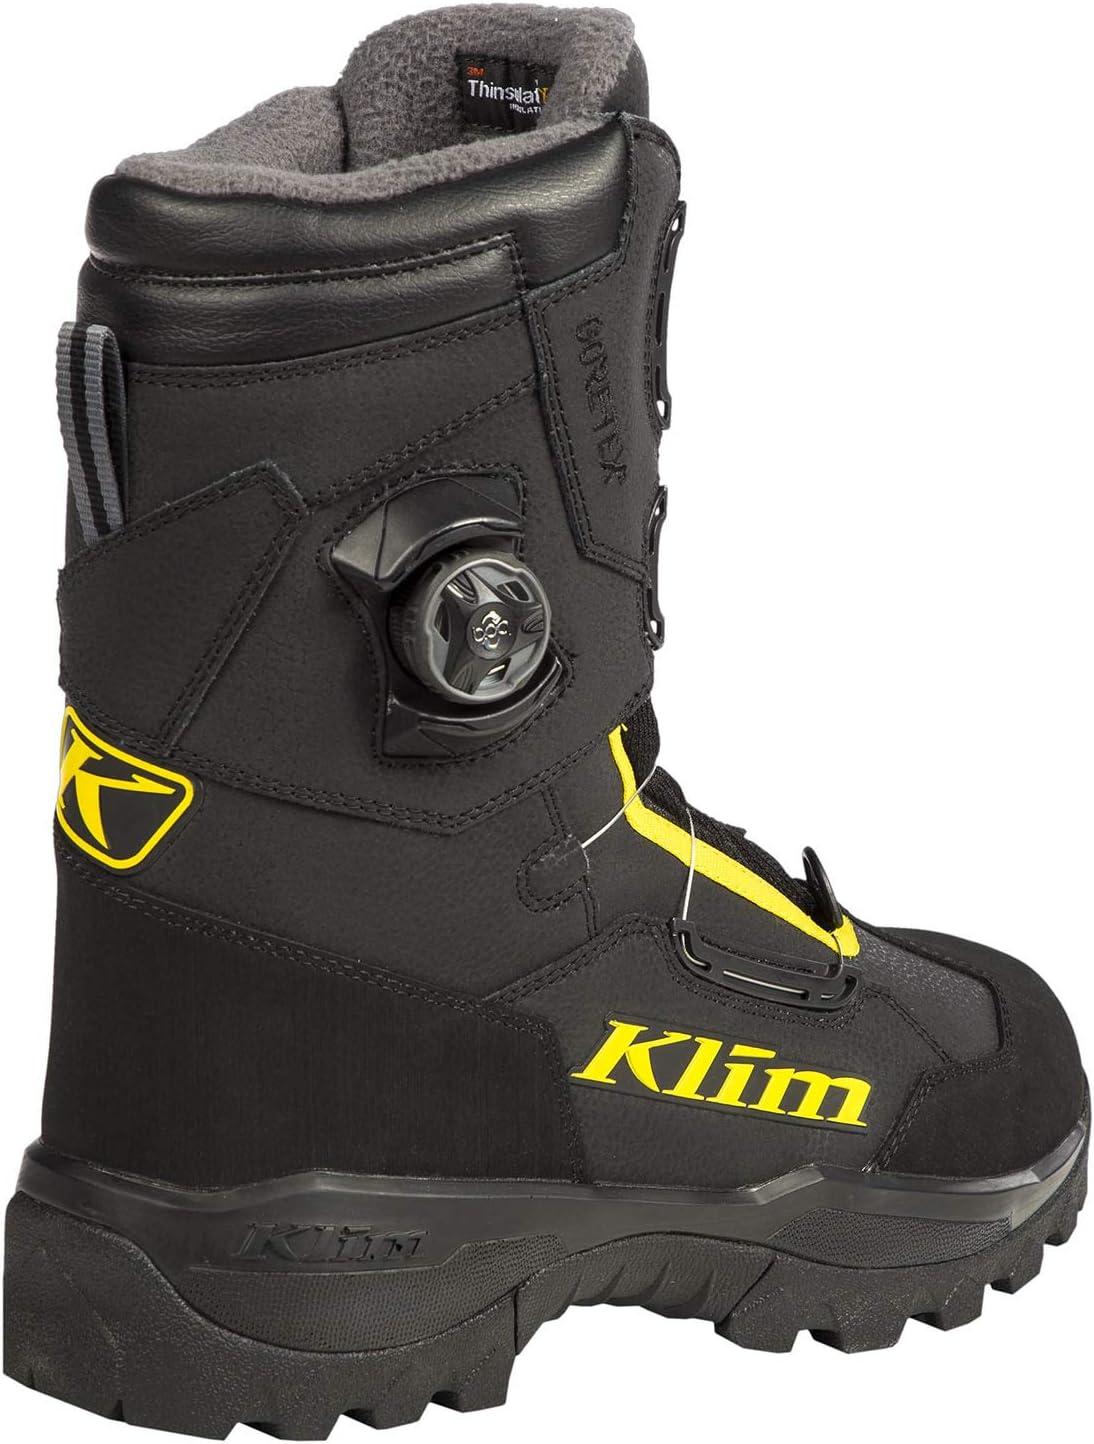 KLIM Adrenaline Pro GTX BOA Boot 14 Black